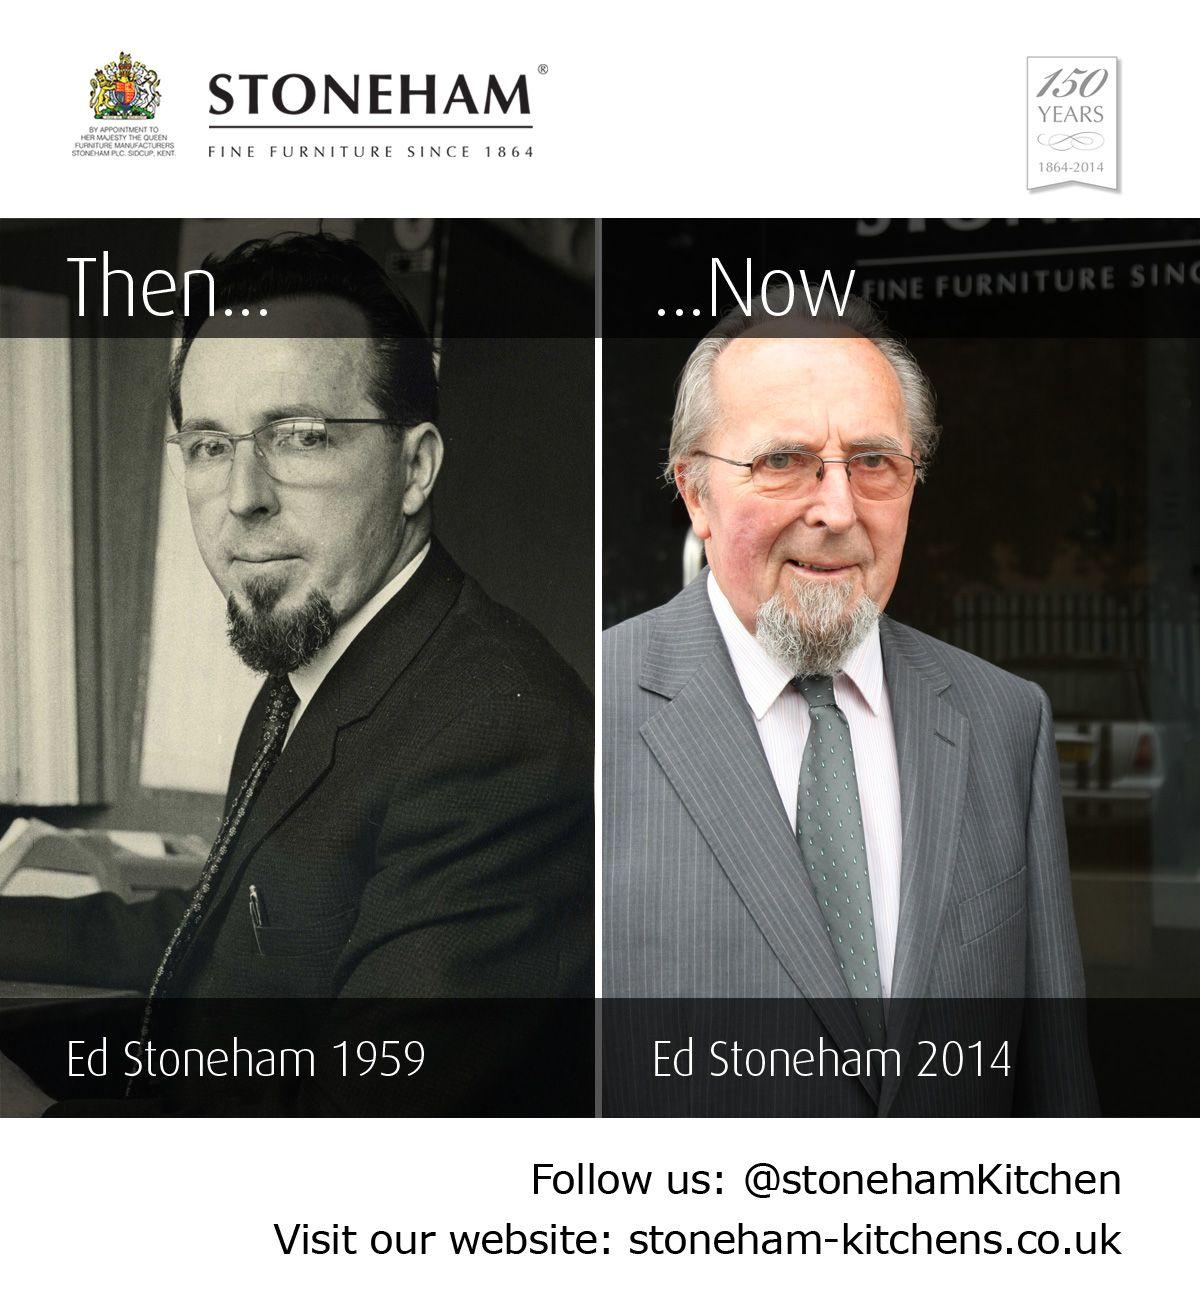 Kitchen Design Tunbridge Wells: Ed Stoneham, Chairman Of Stoneham Kitchens, Then And Now